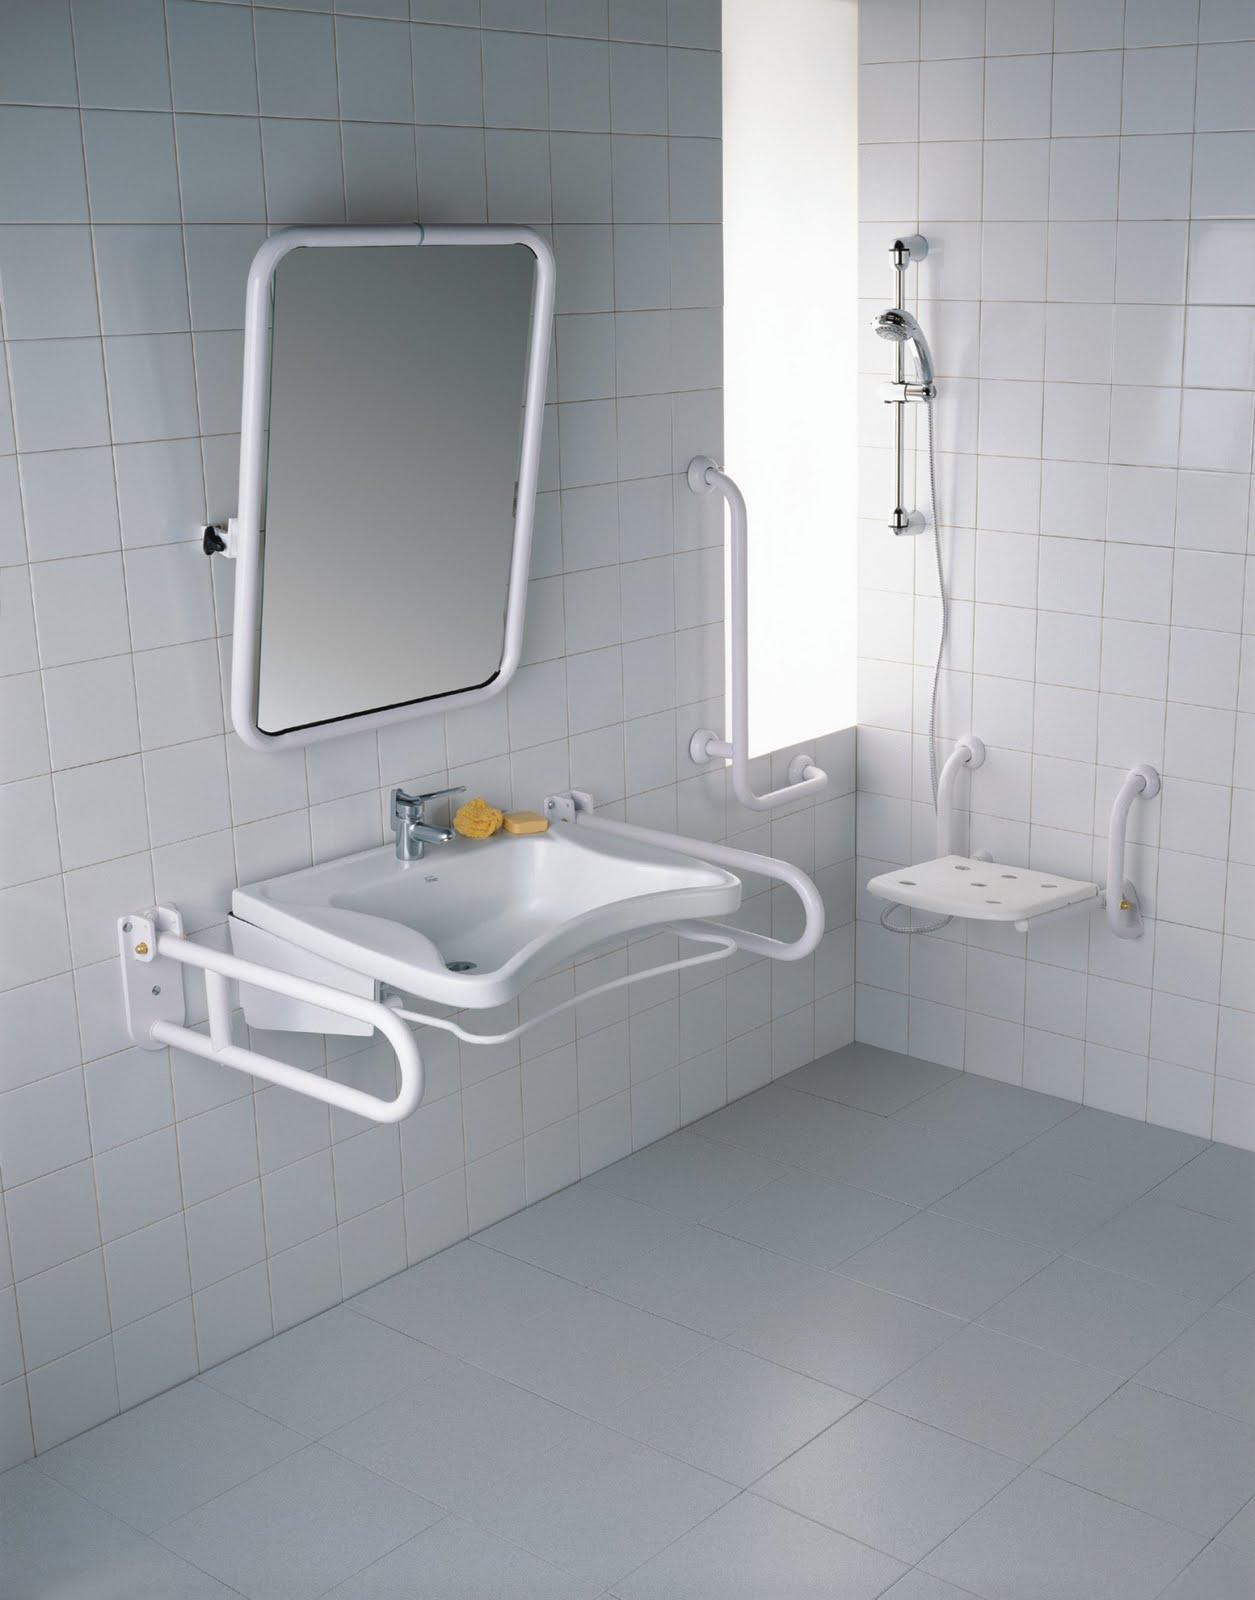 NORMAS DE ACESSIBILIDADE NBR9050 DA ABNT: Banheiro seguro #947437 1255x1600 Banheiro Acessivel Norma 9050